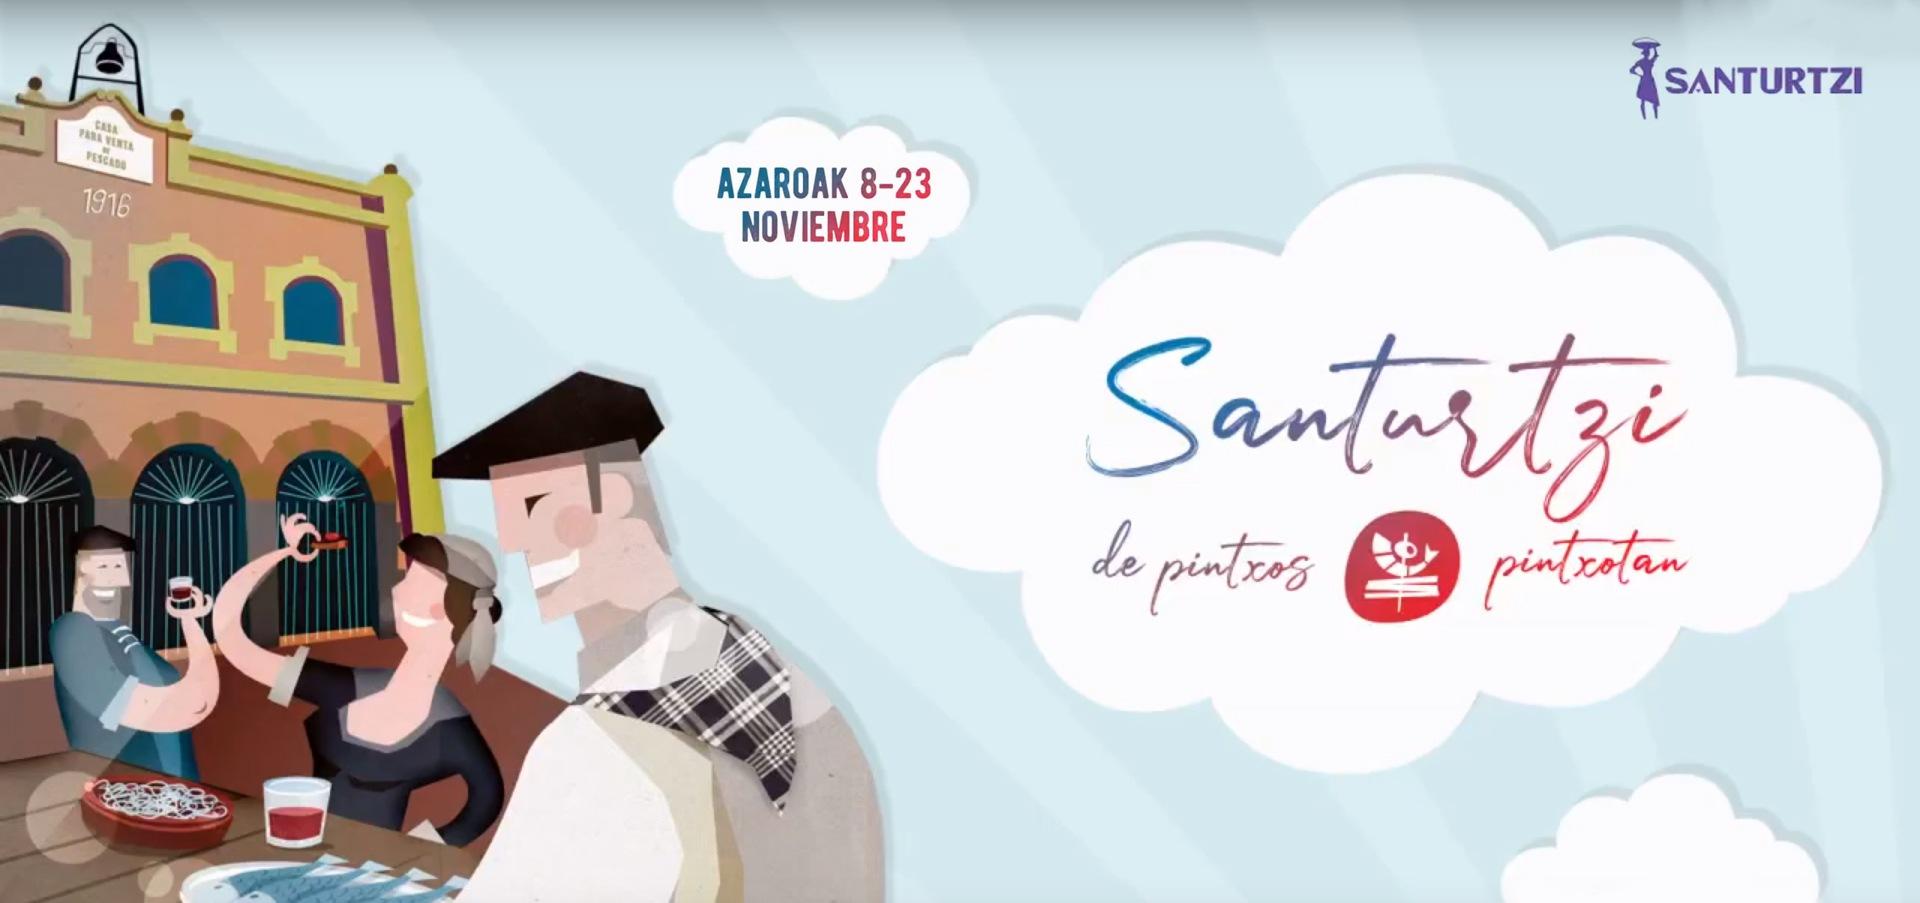 Santurzi-de-pintxos-pintxotan-noviembre-azaroak-2019